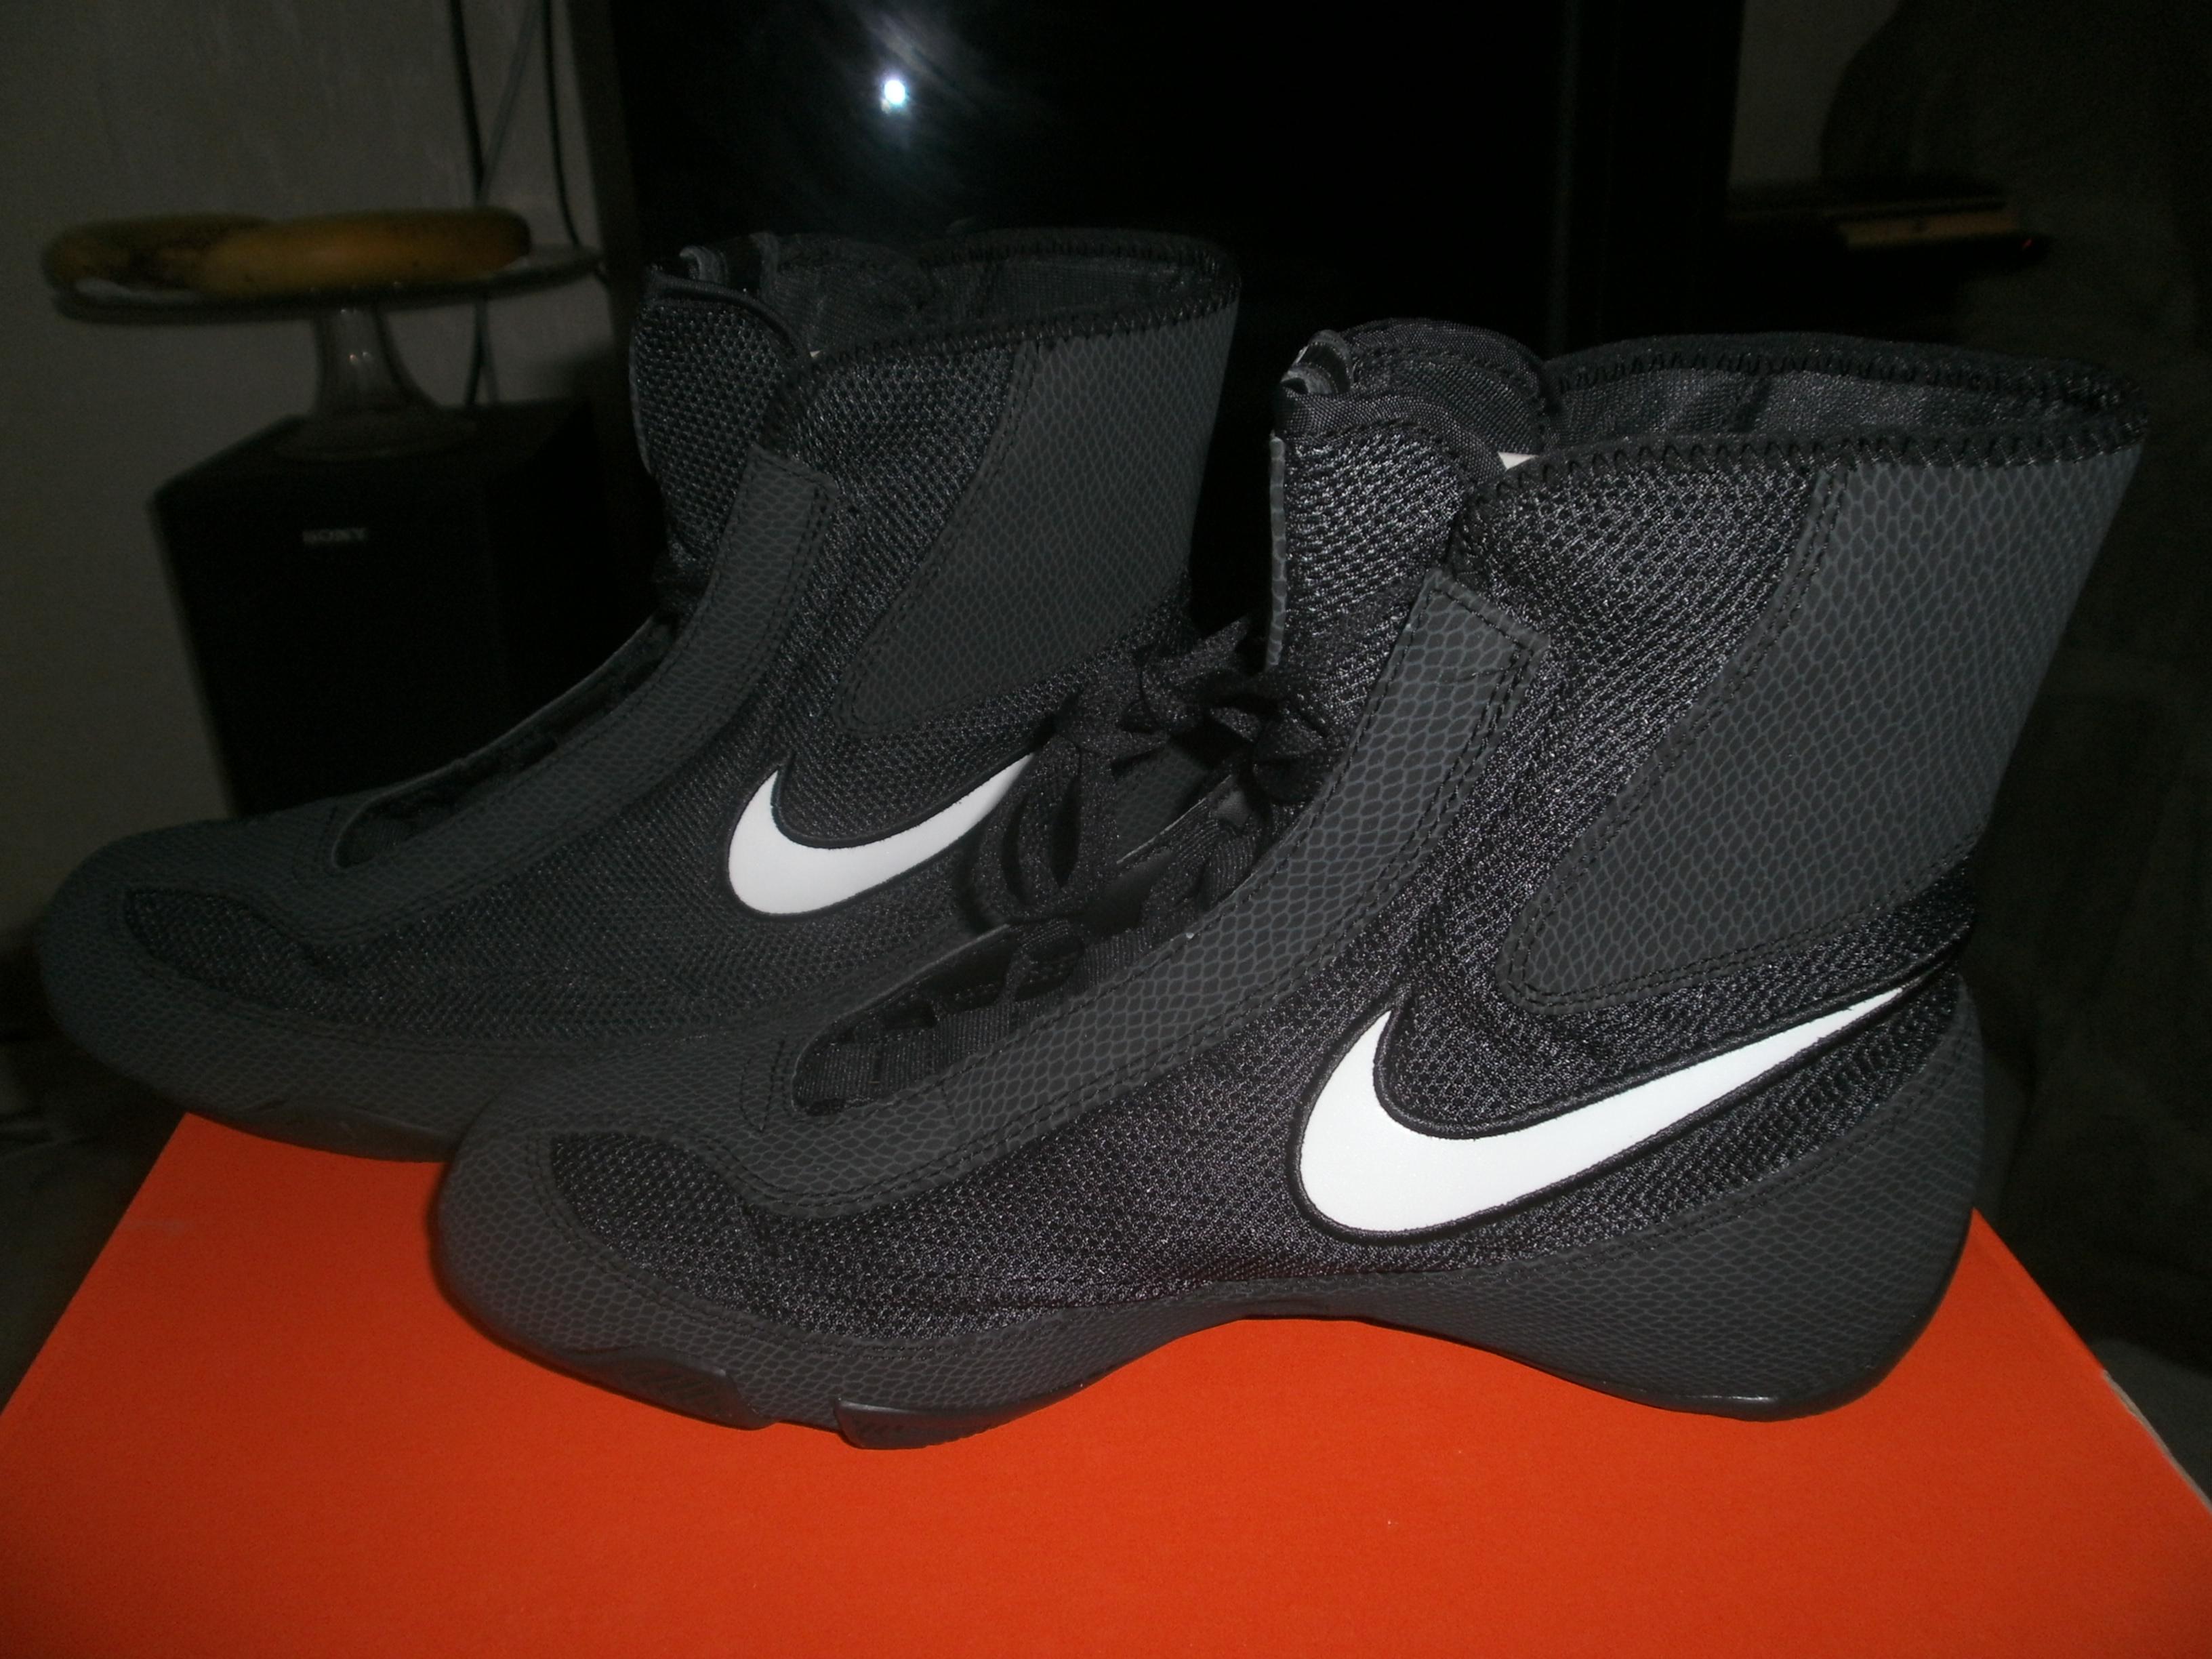 adidas chaussures boxe française